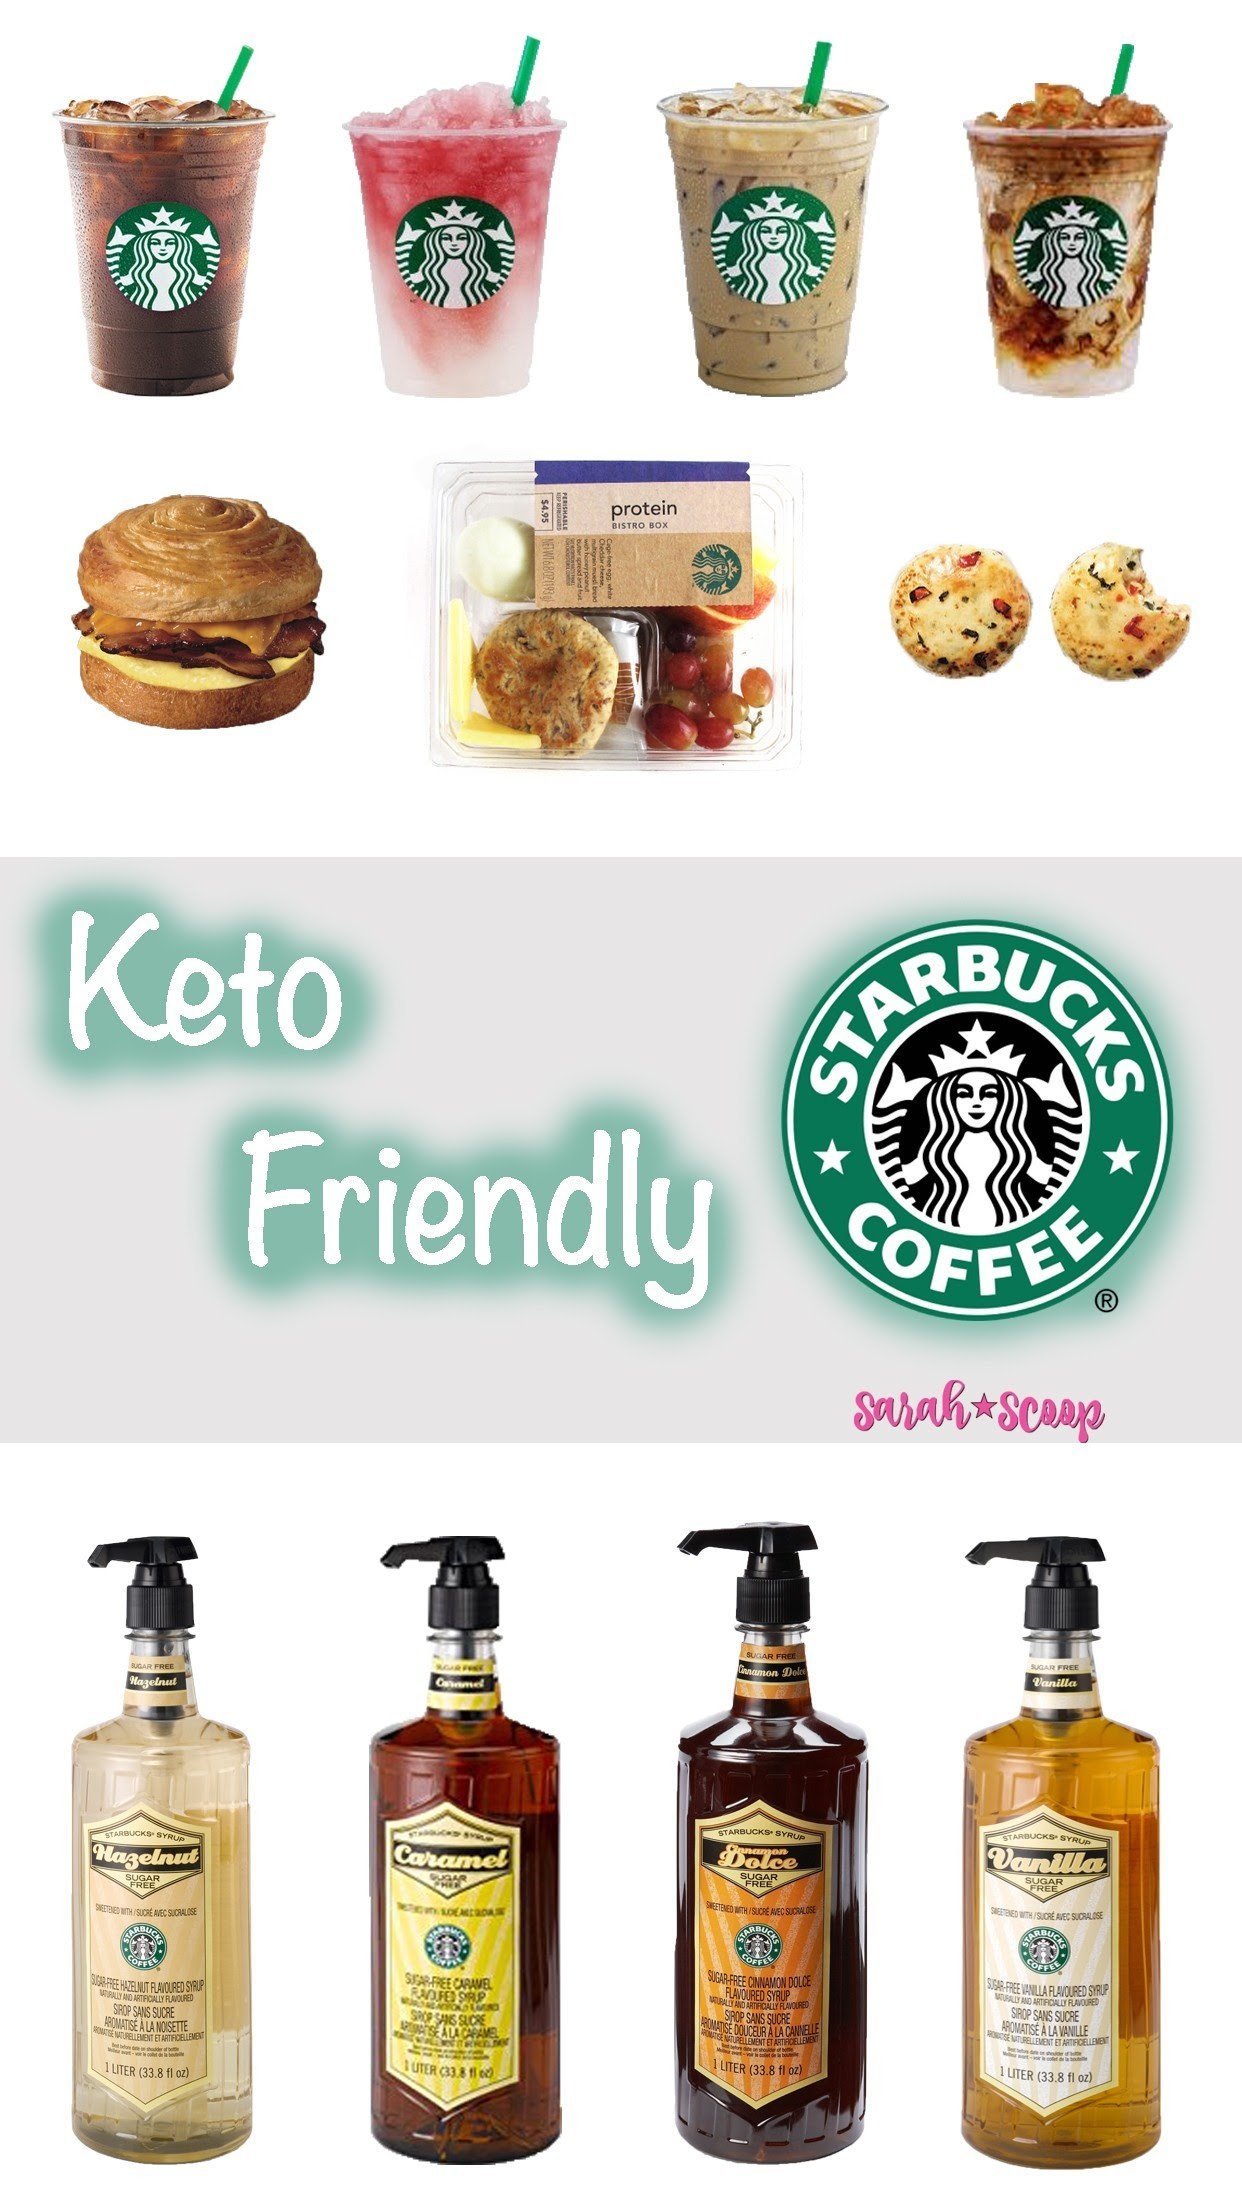 Sugar Free Coffee Creamer Keto - healthy food recipes to